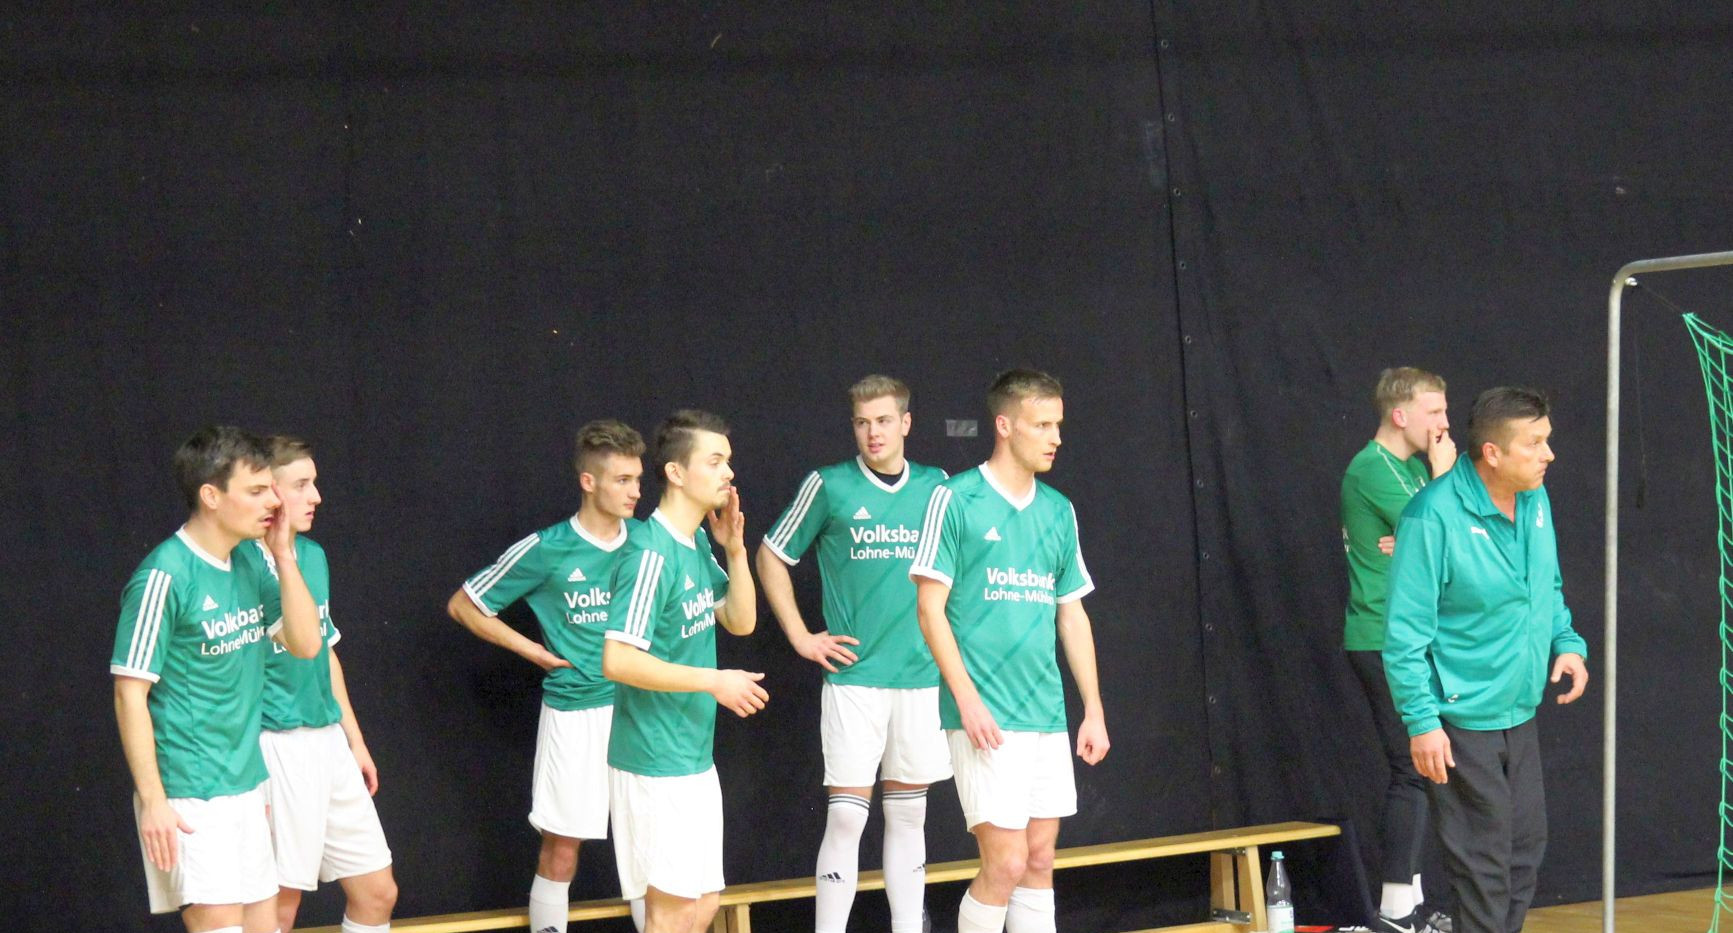 OV-Supercup-201219-032.jpg